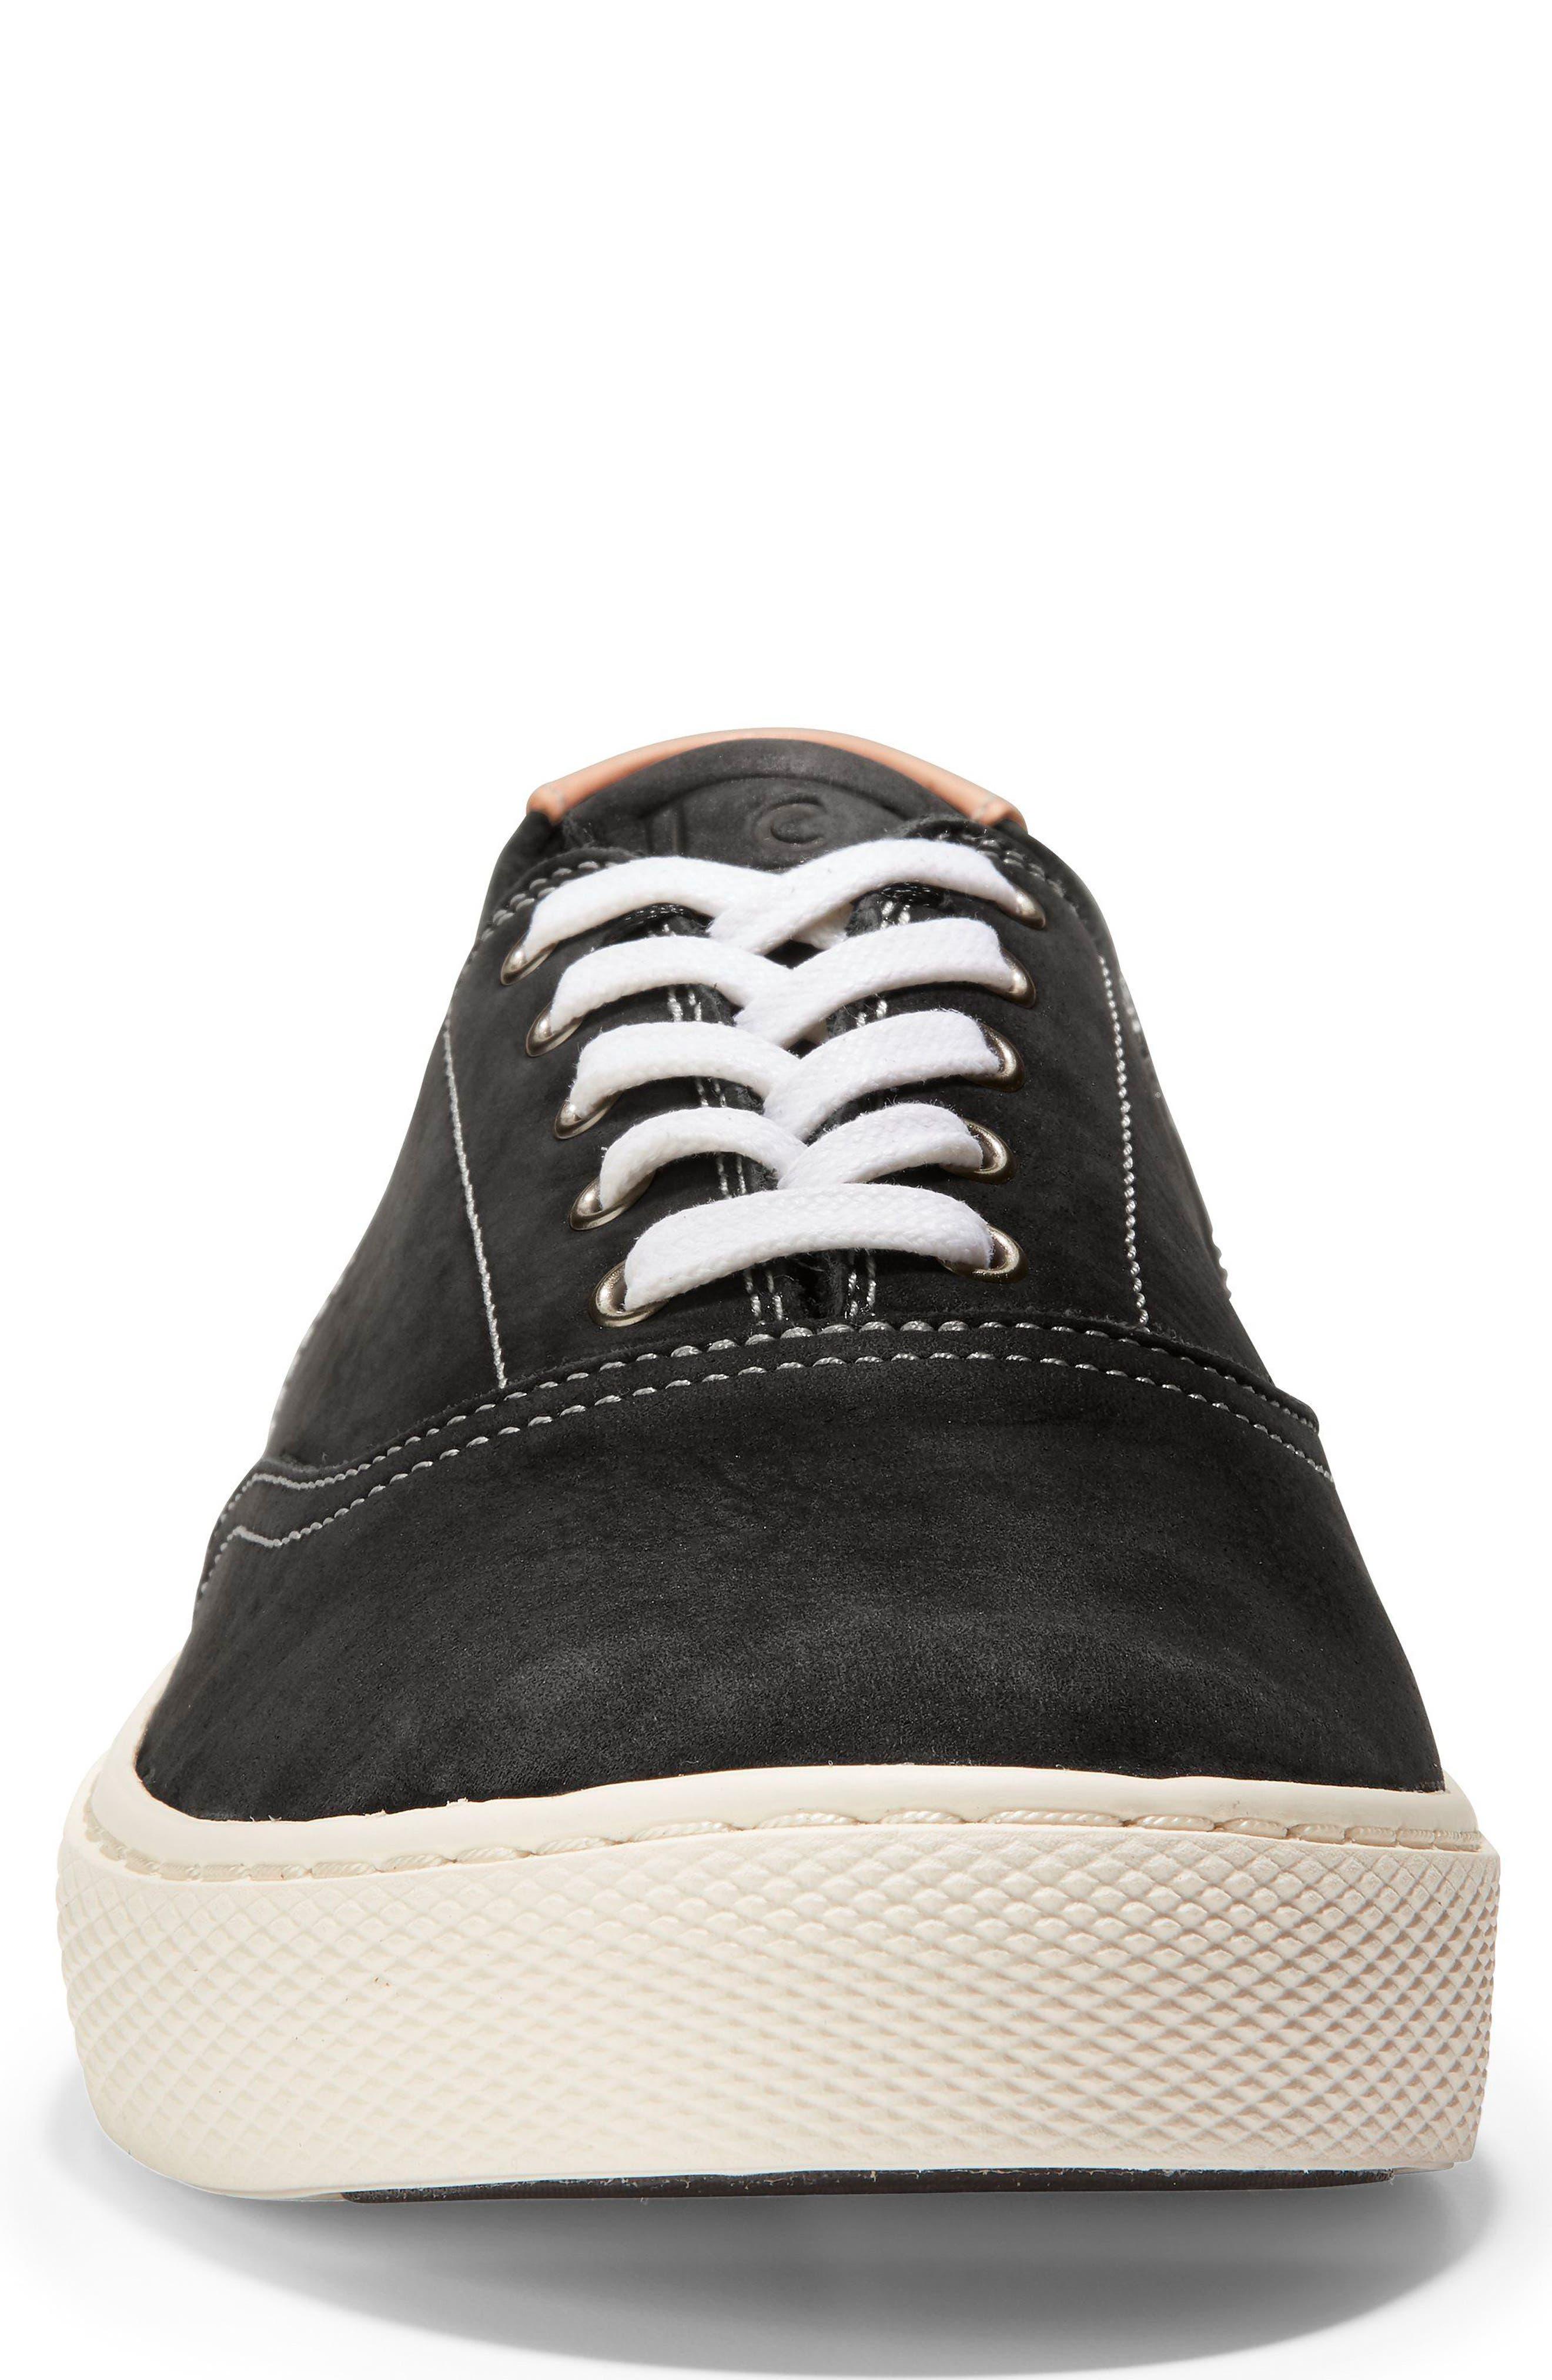 GrandPro Deck Low Top Sneaker,                             Alternate thumbnail 4, color,                             001